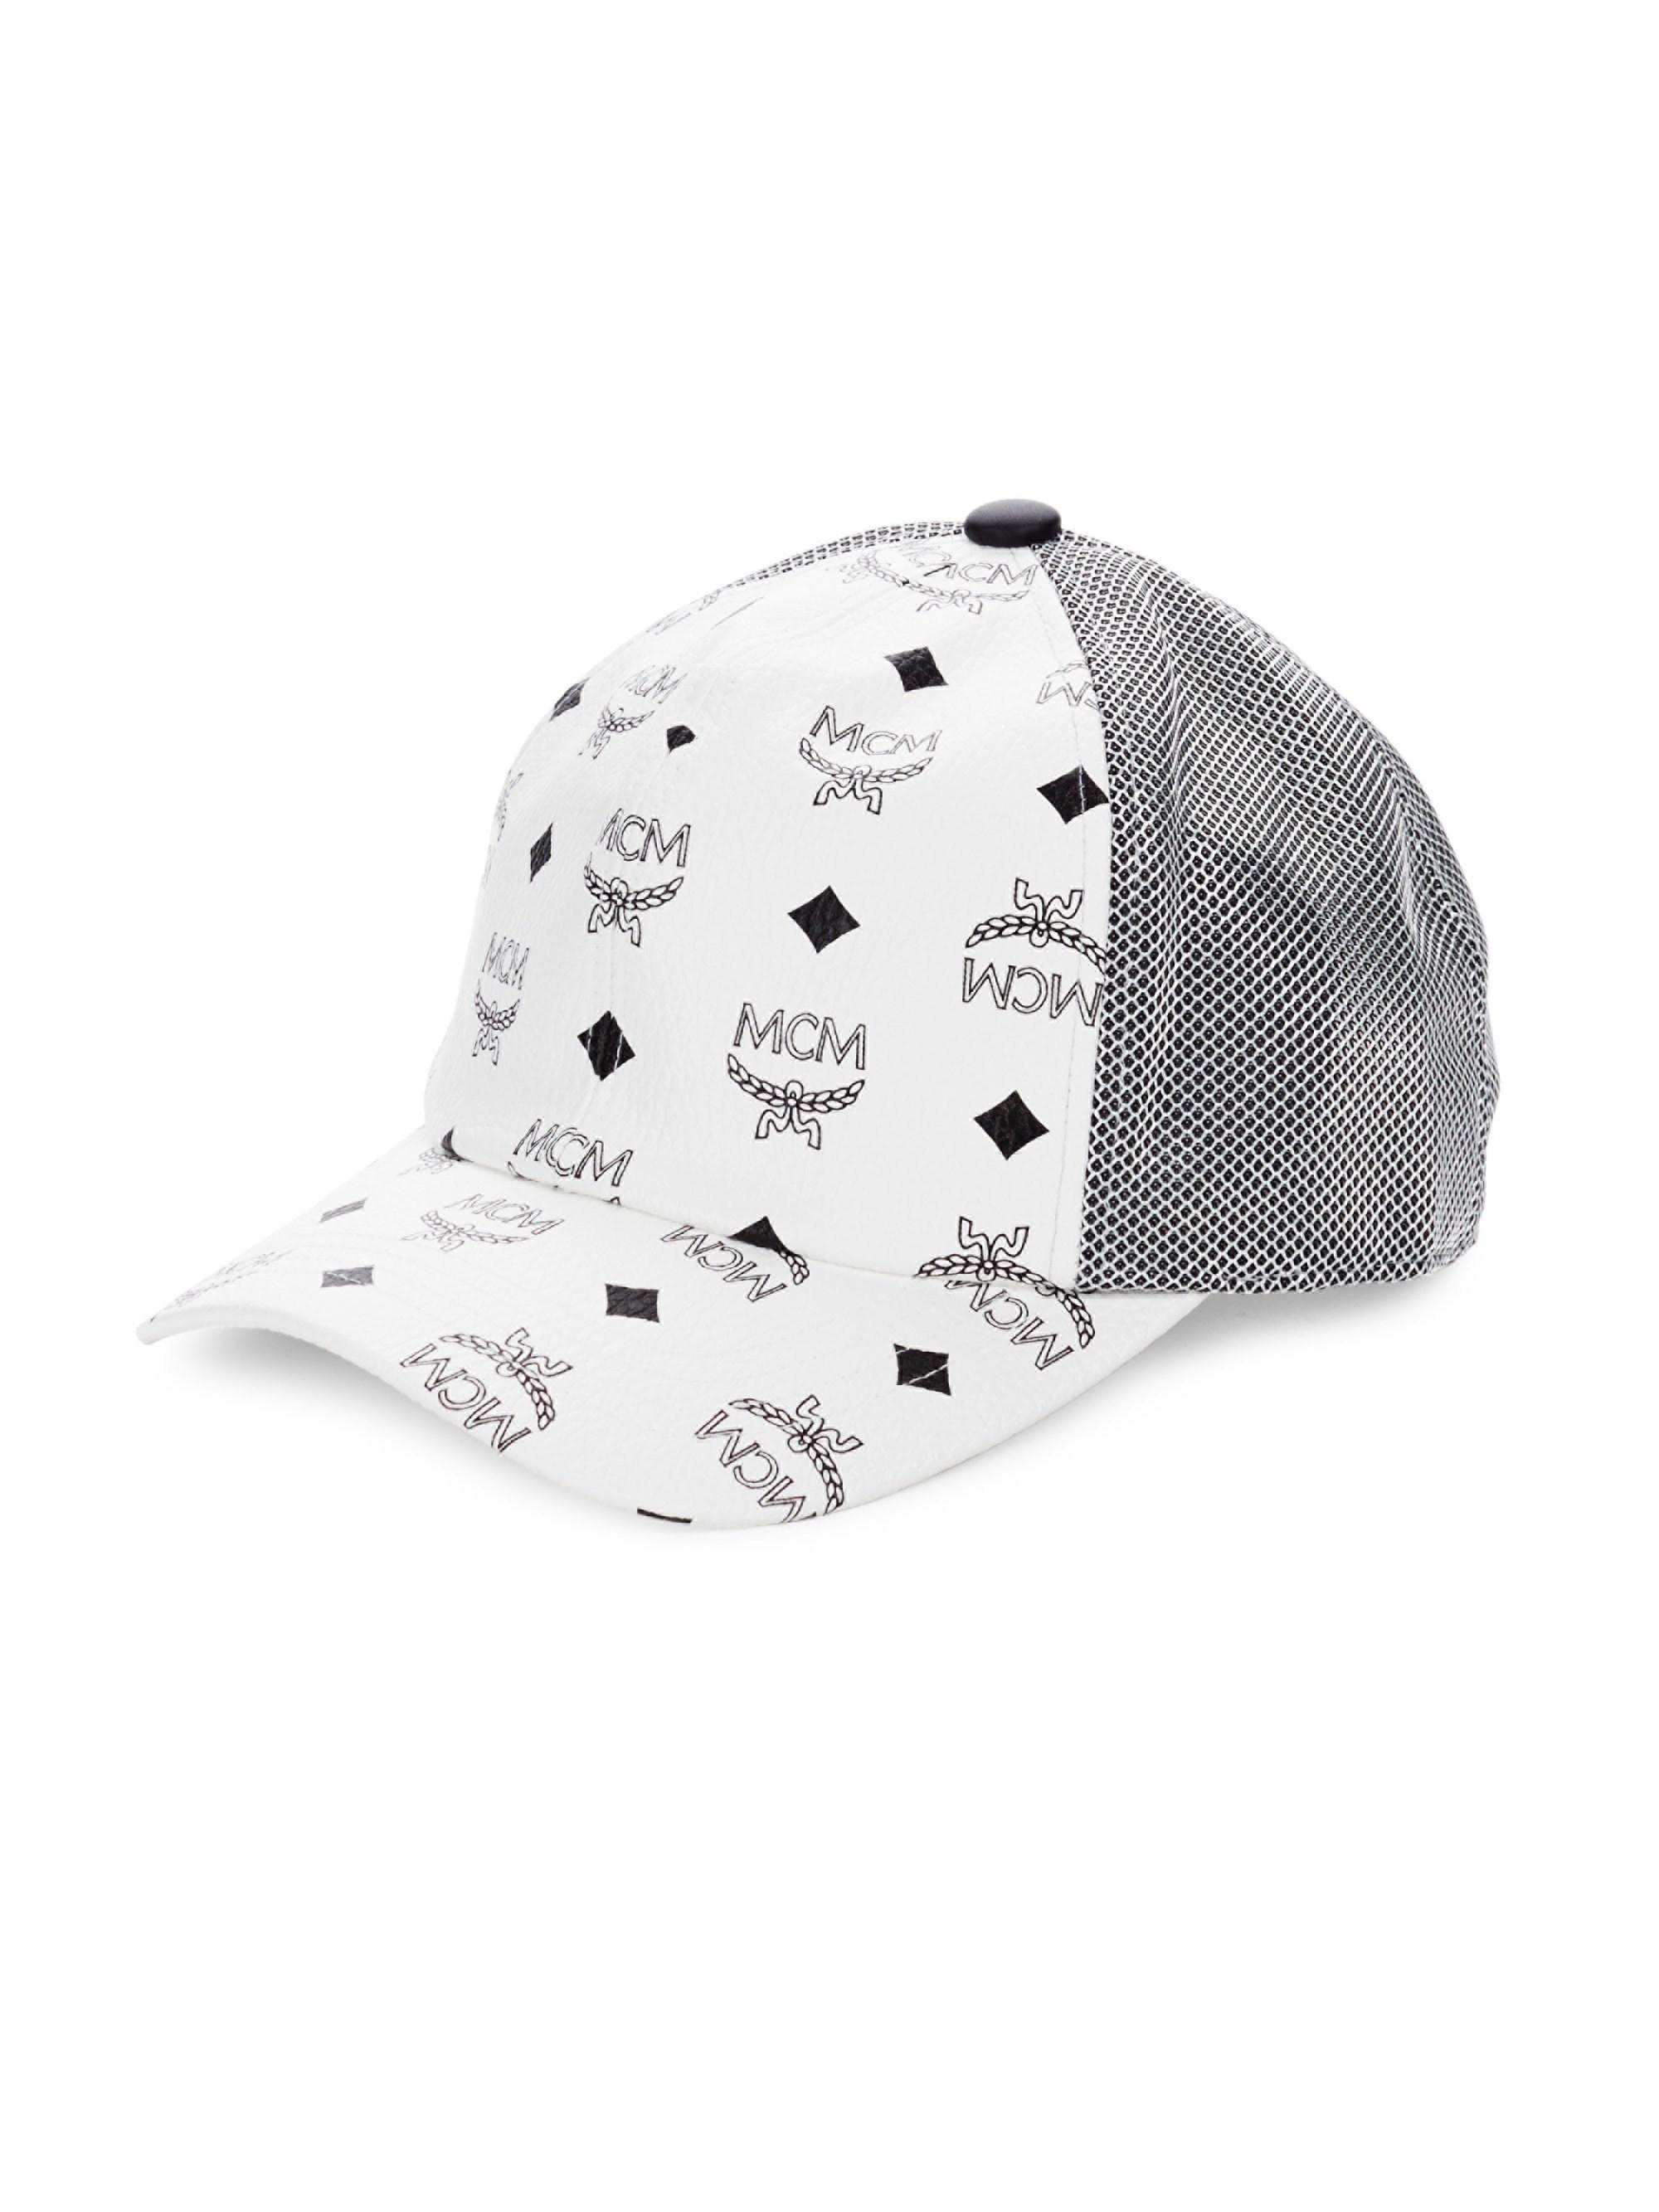 059e12527de Lyst - MCM Visetos Canvas Mesh Baseball Cap in White for Men